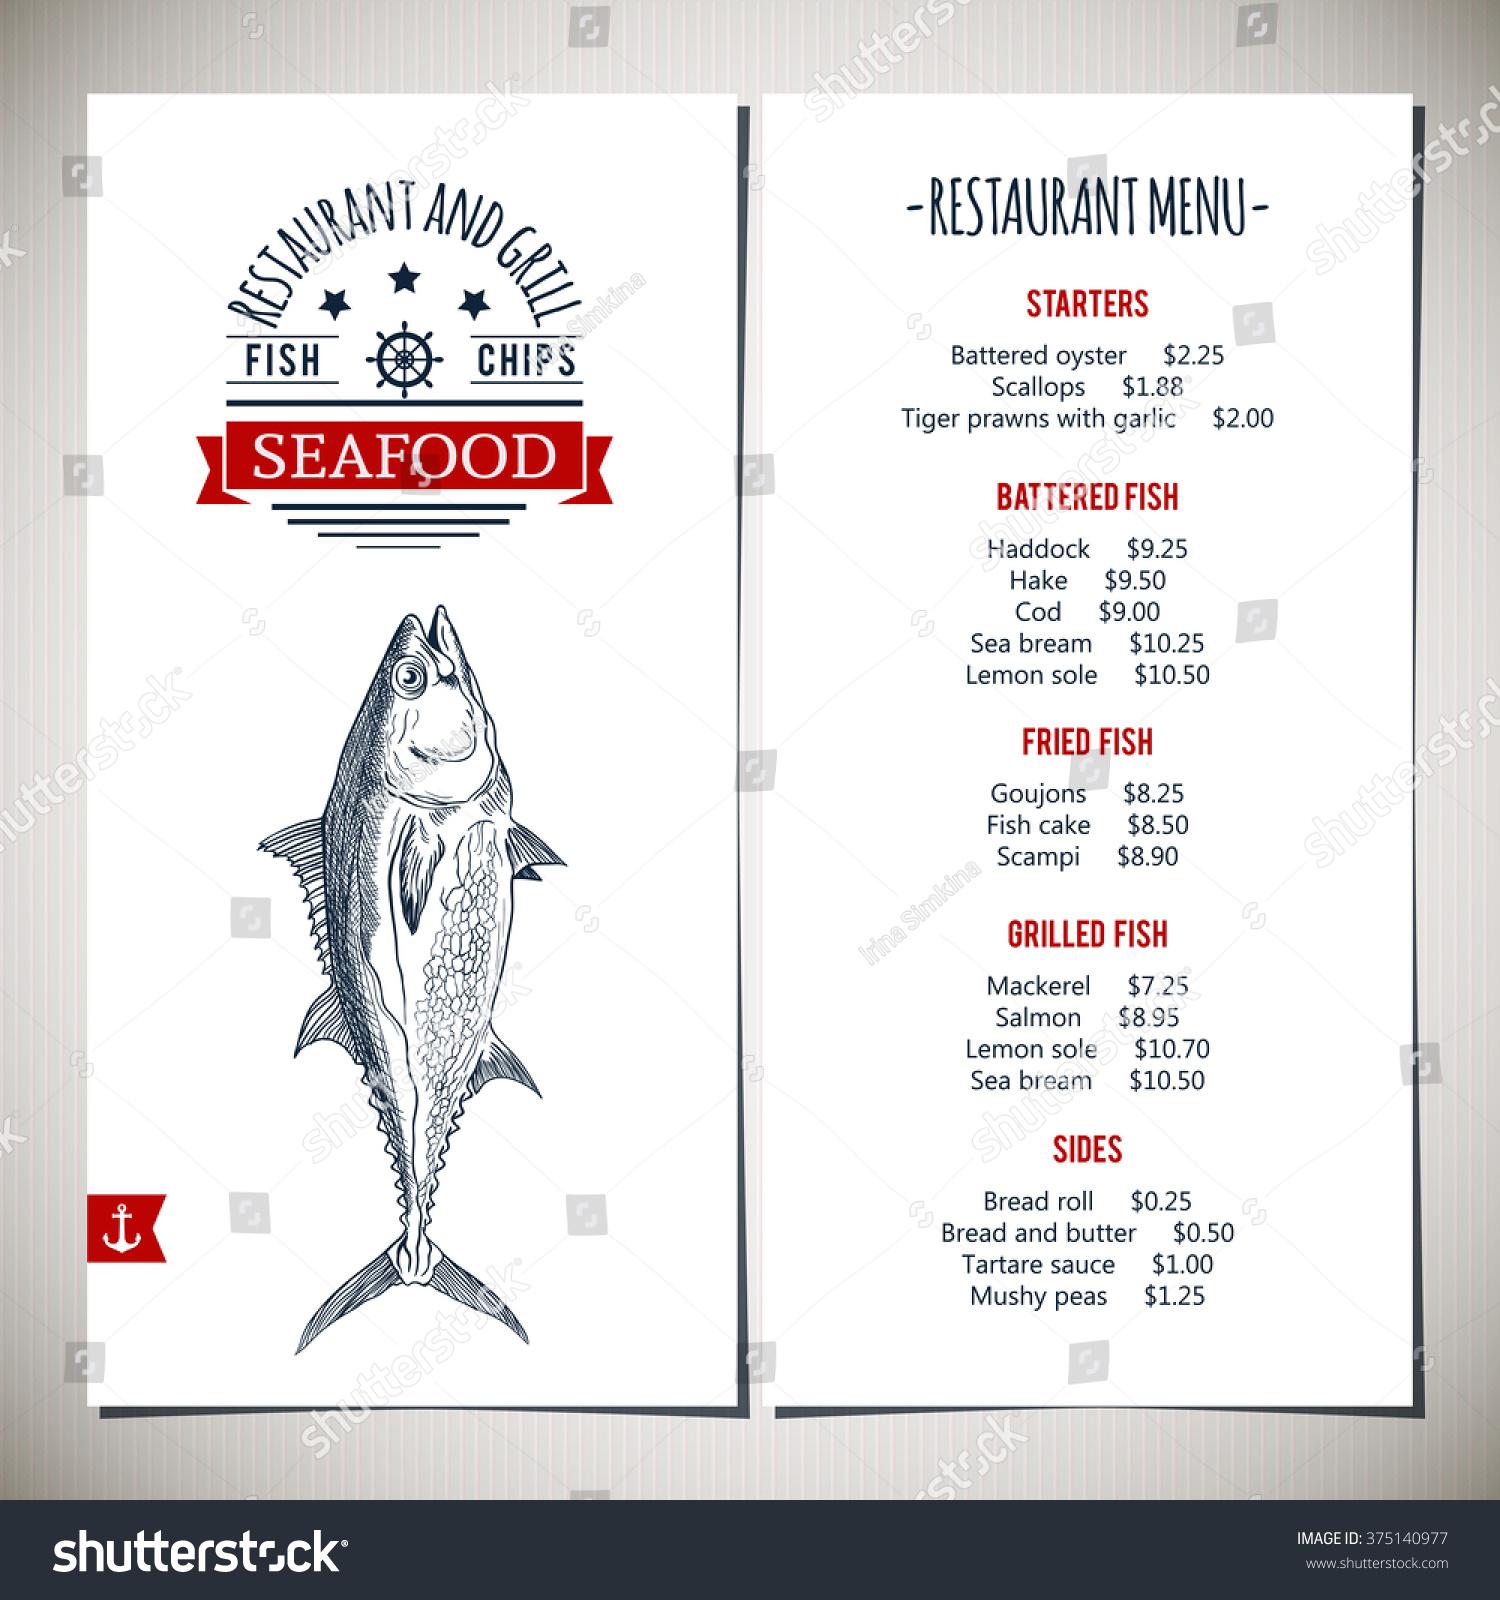 Tuna fish restaurant menu template vector for Big fish restaurant menu